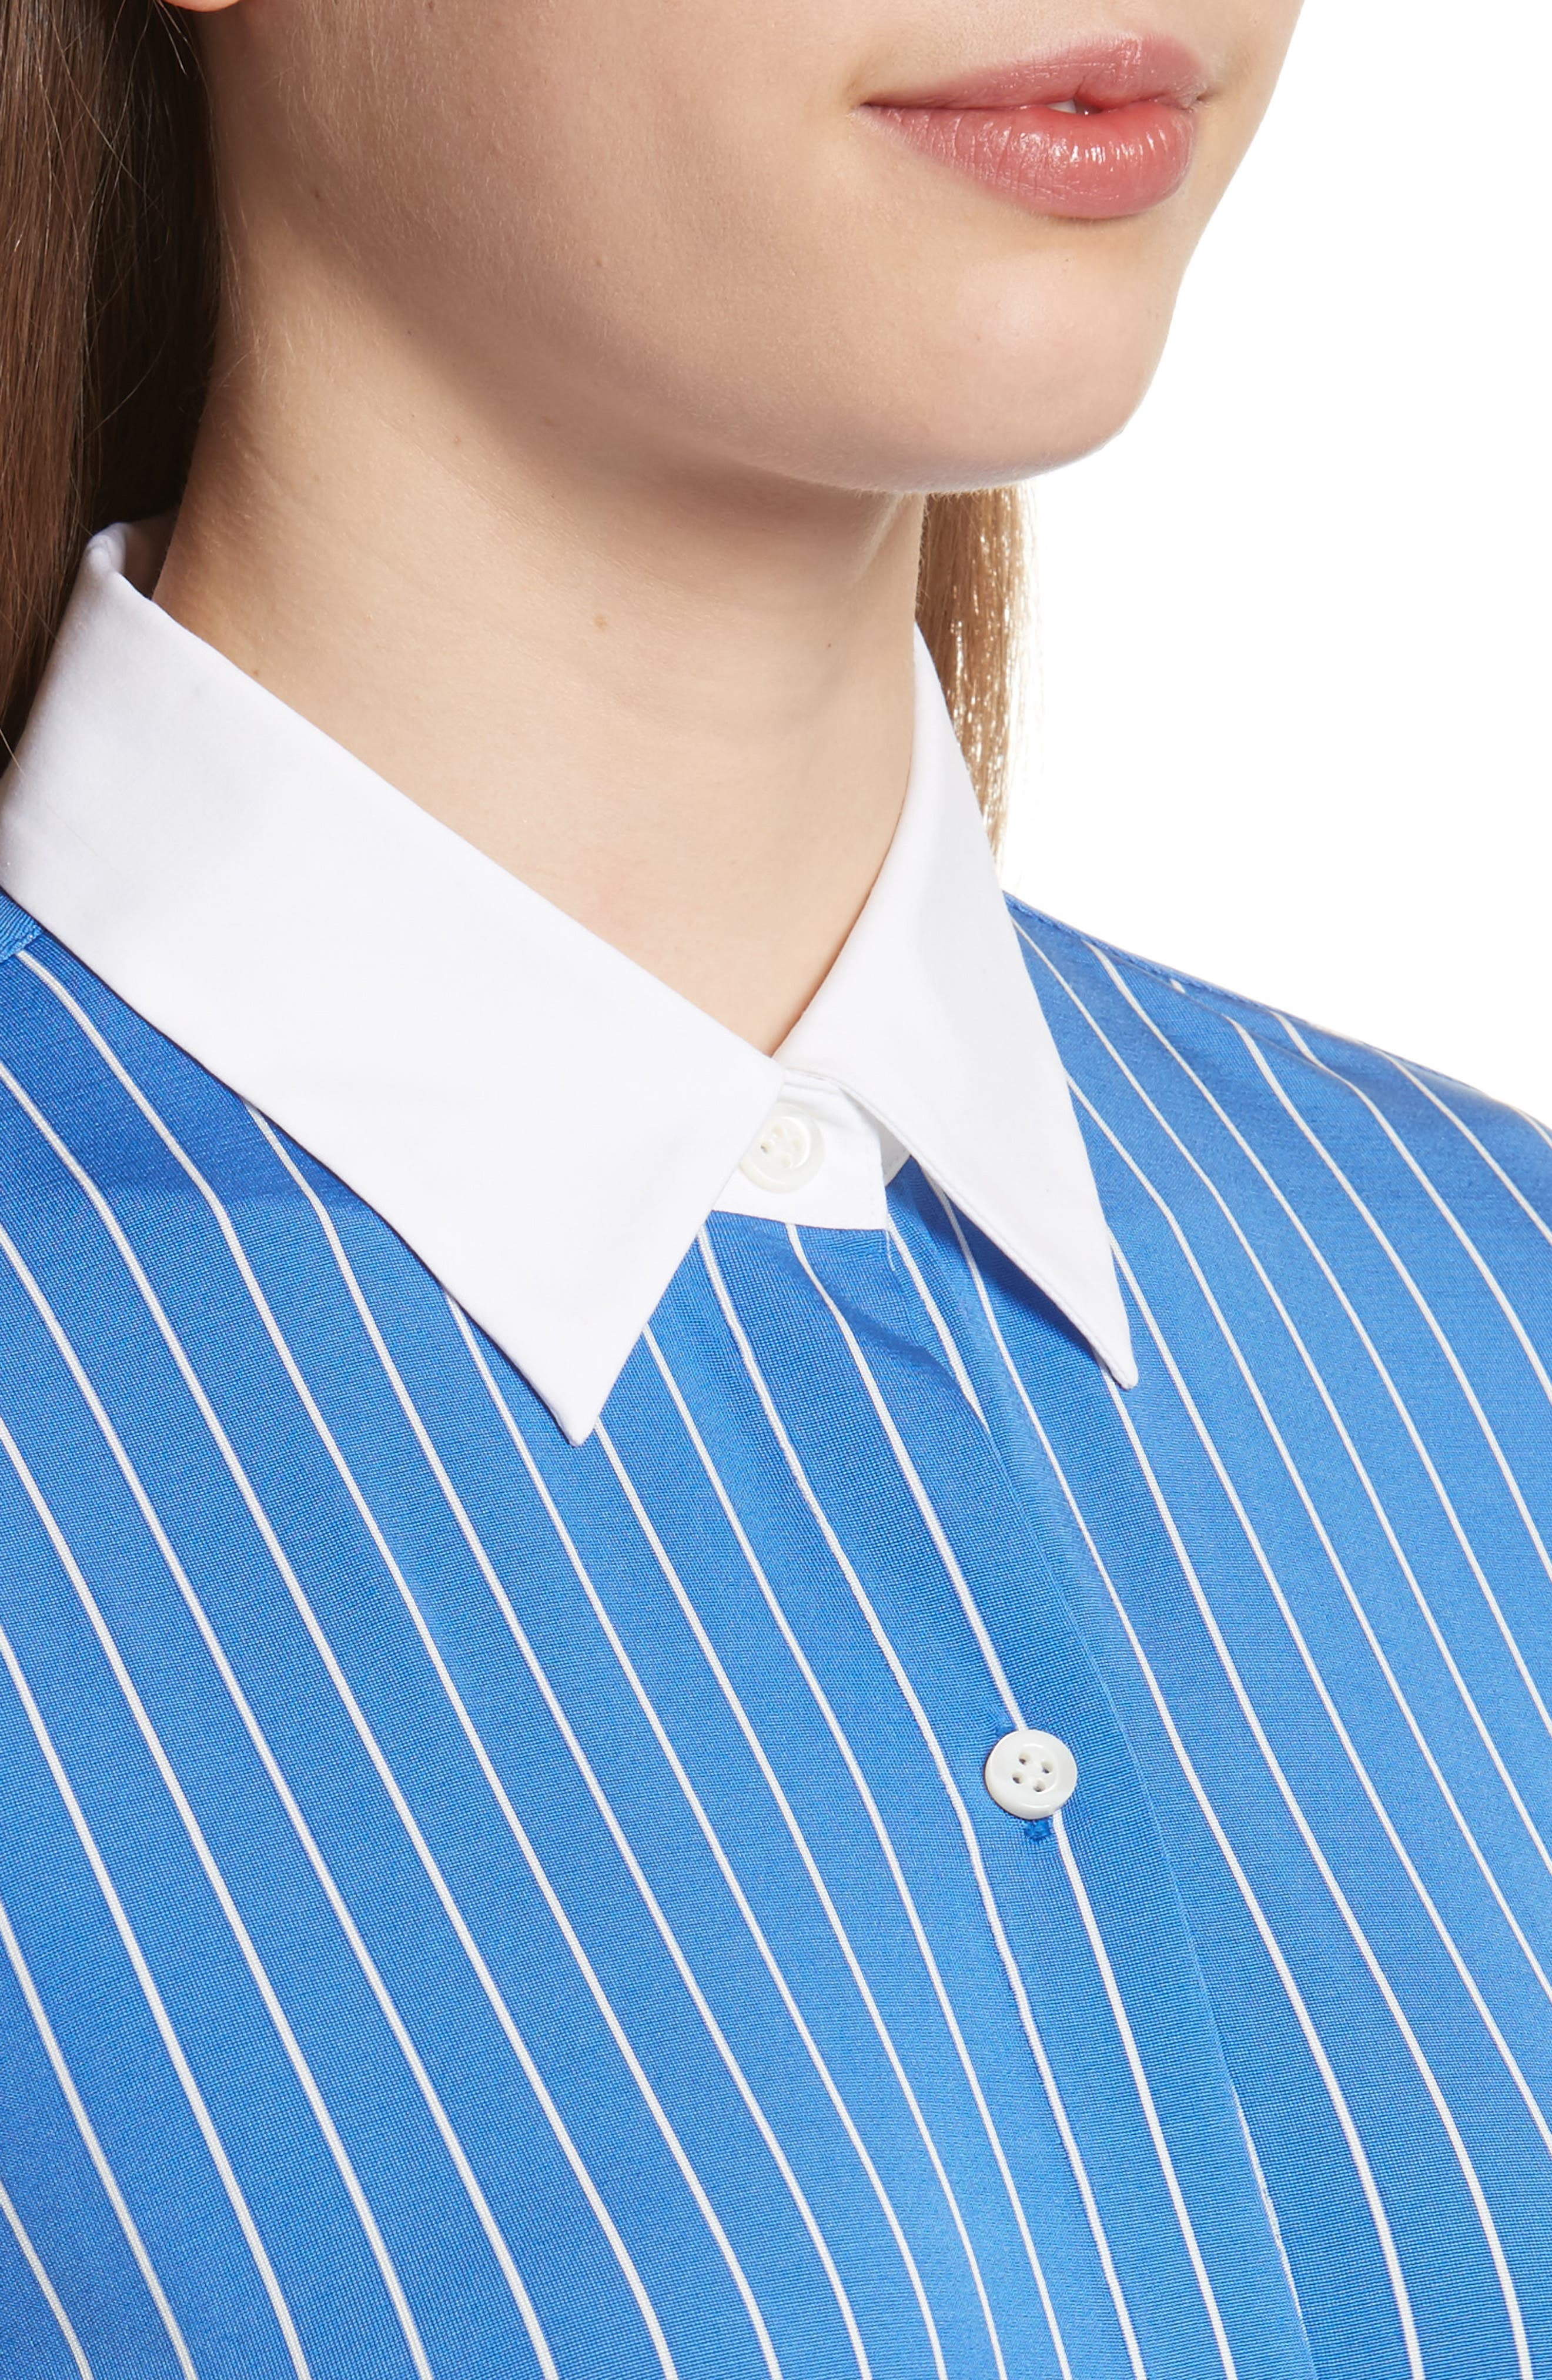 Essential Stripe Jersey Button Down Shirt,                             Alternate thumbnail 4, color,                             Blue/ White